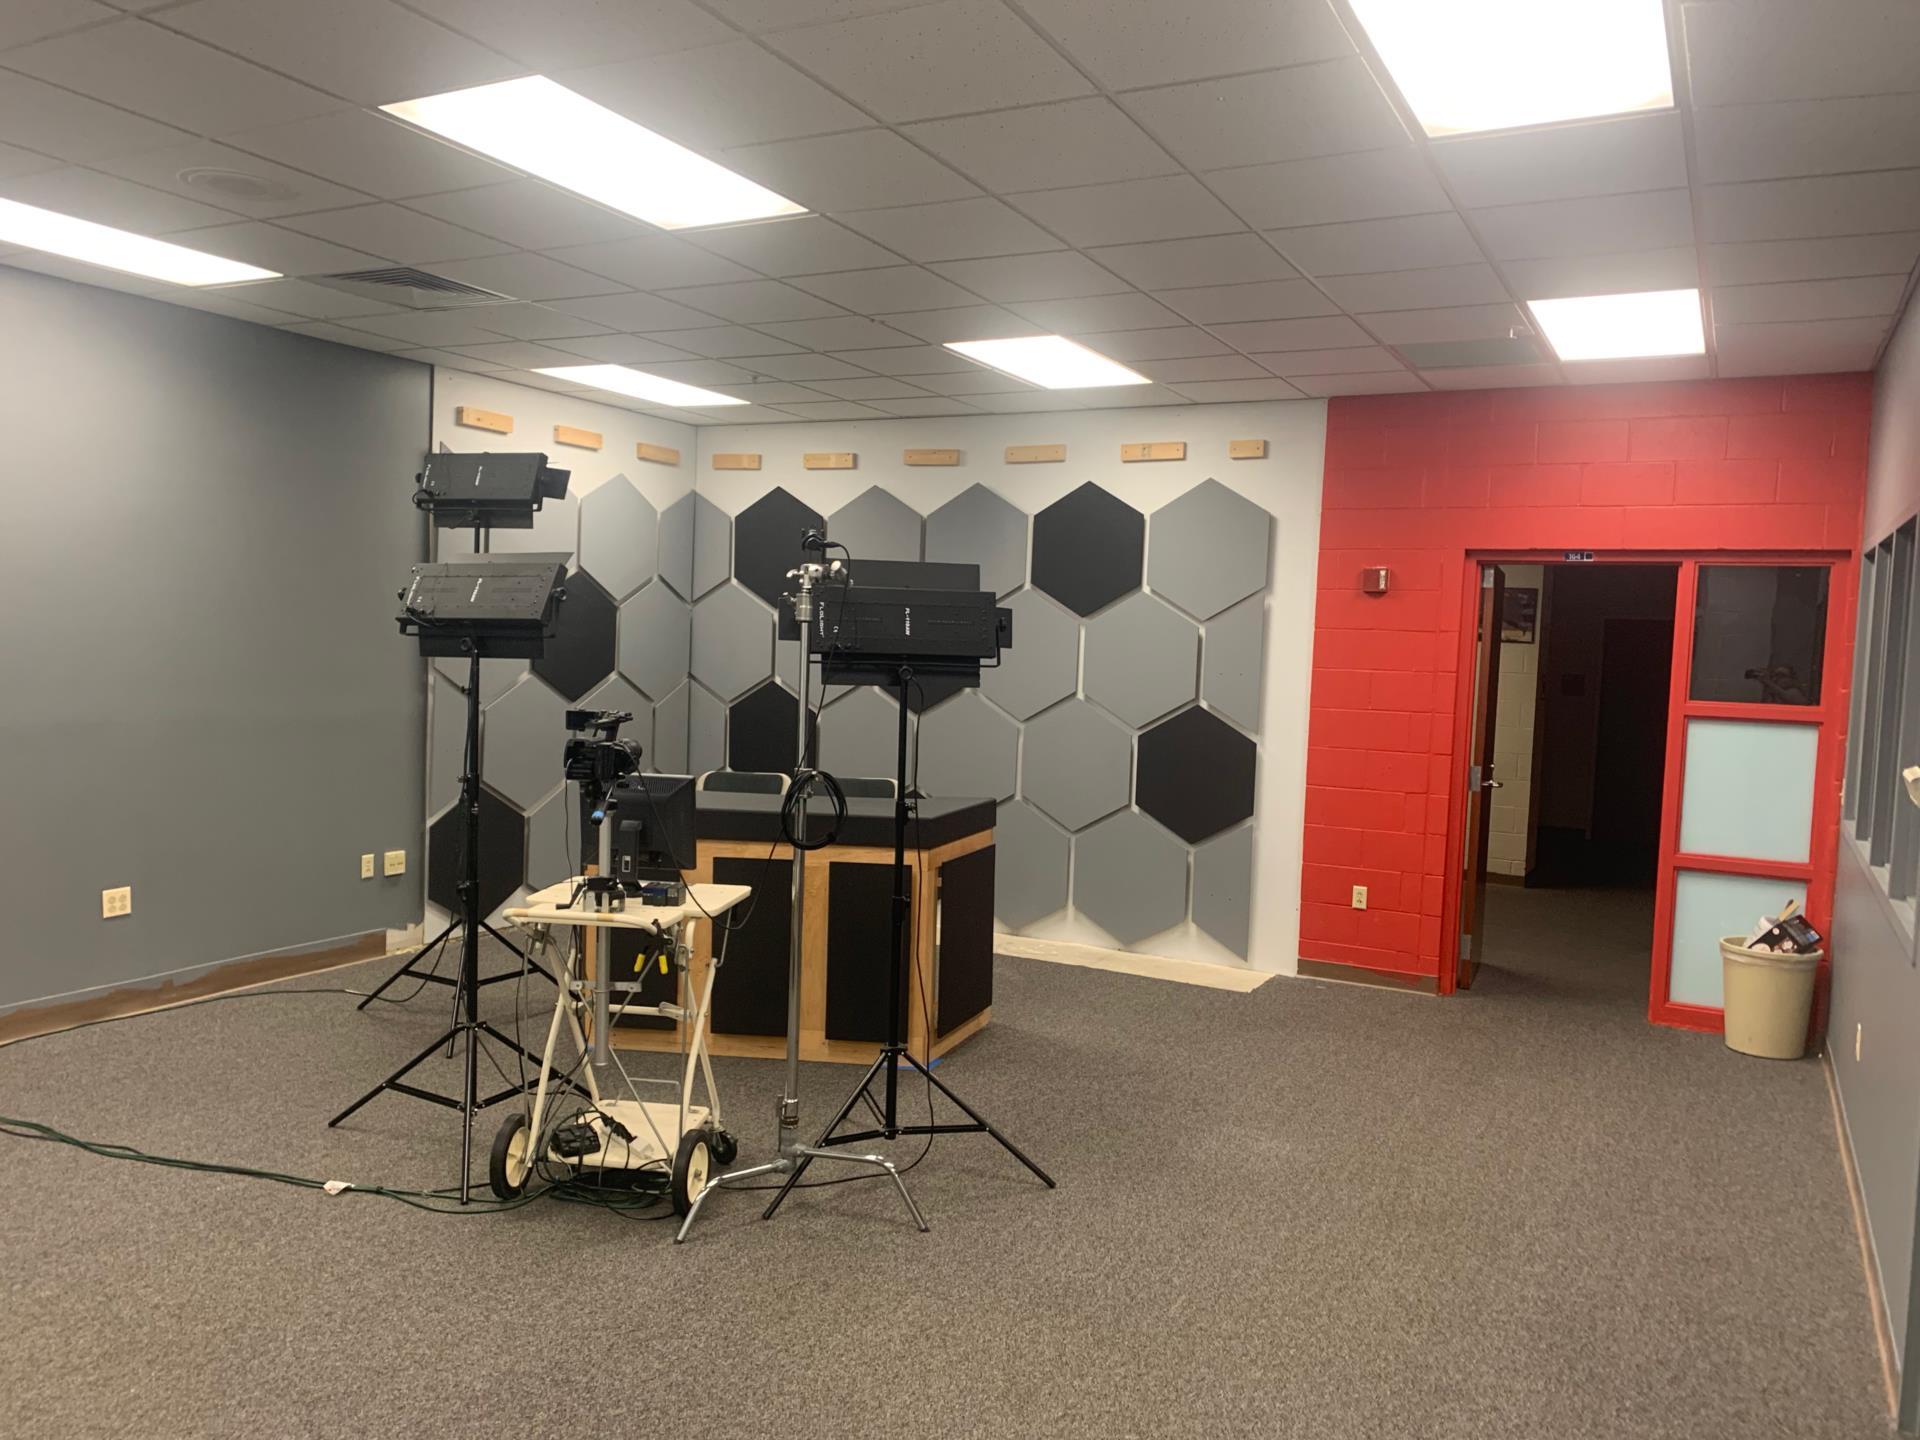 BeeTV finished renovations